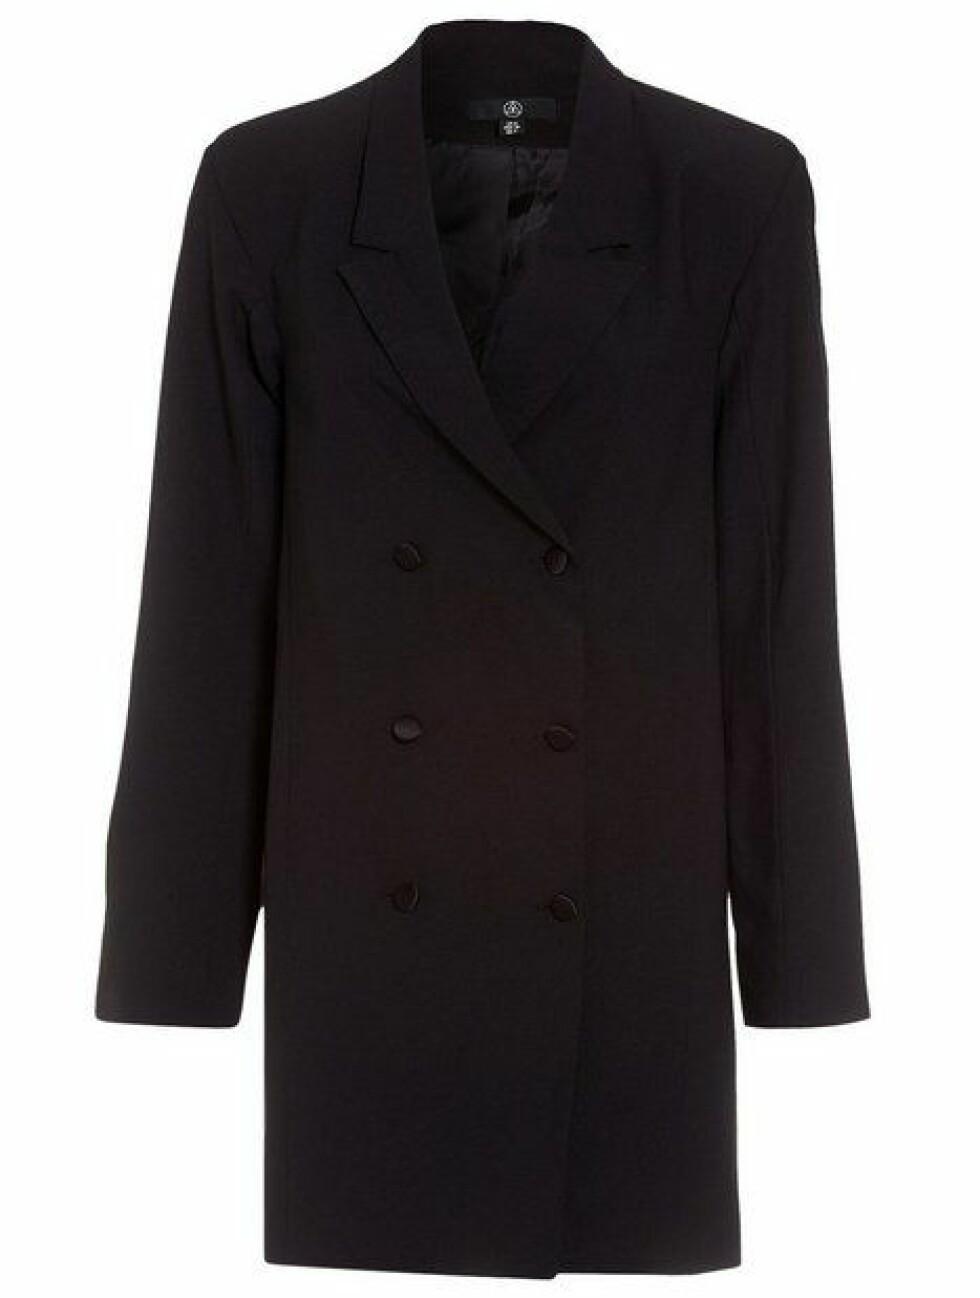 Missguided |449,-| https://nelly.com/no/kl%C3%A6r-til-kvinner/kl%C3%A6r/festkjoler/missguided-201538/crepe-belted-button-blazer-dress-605915-0426/